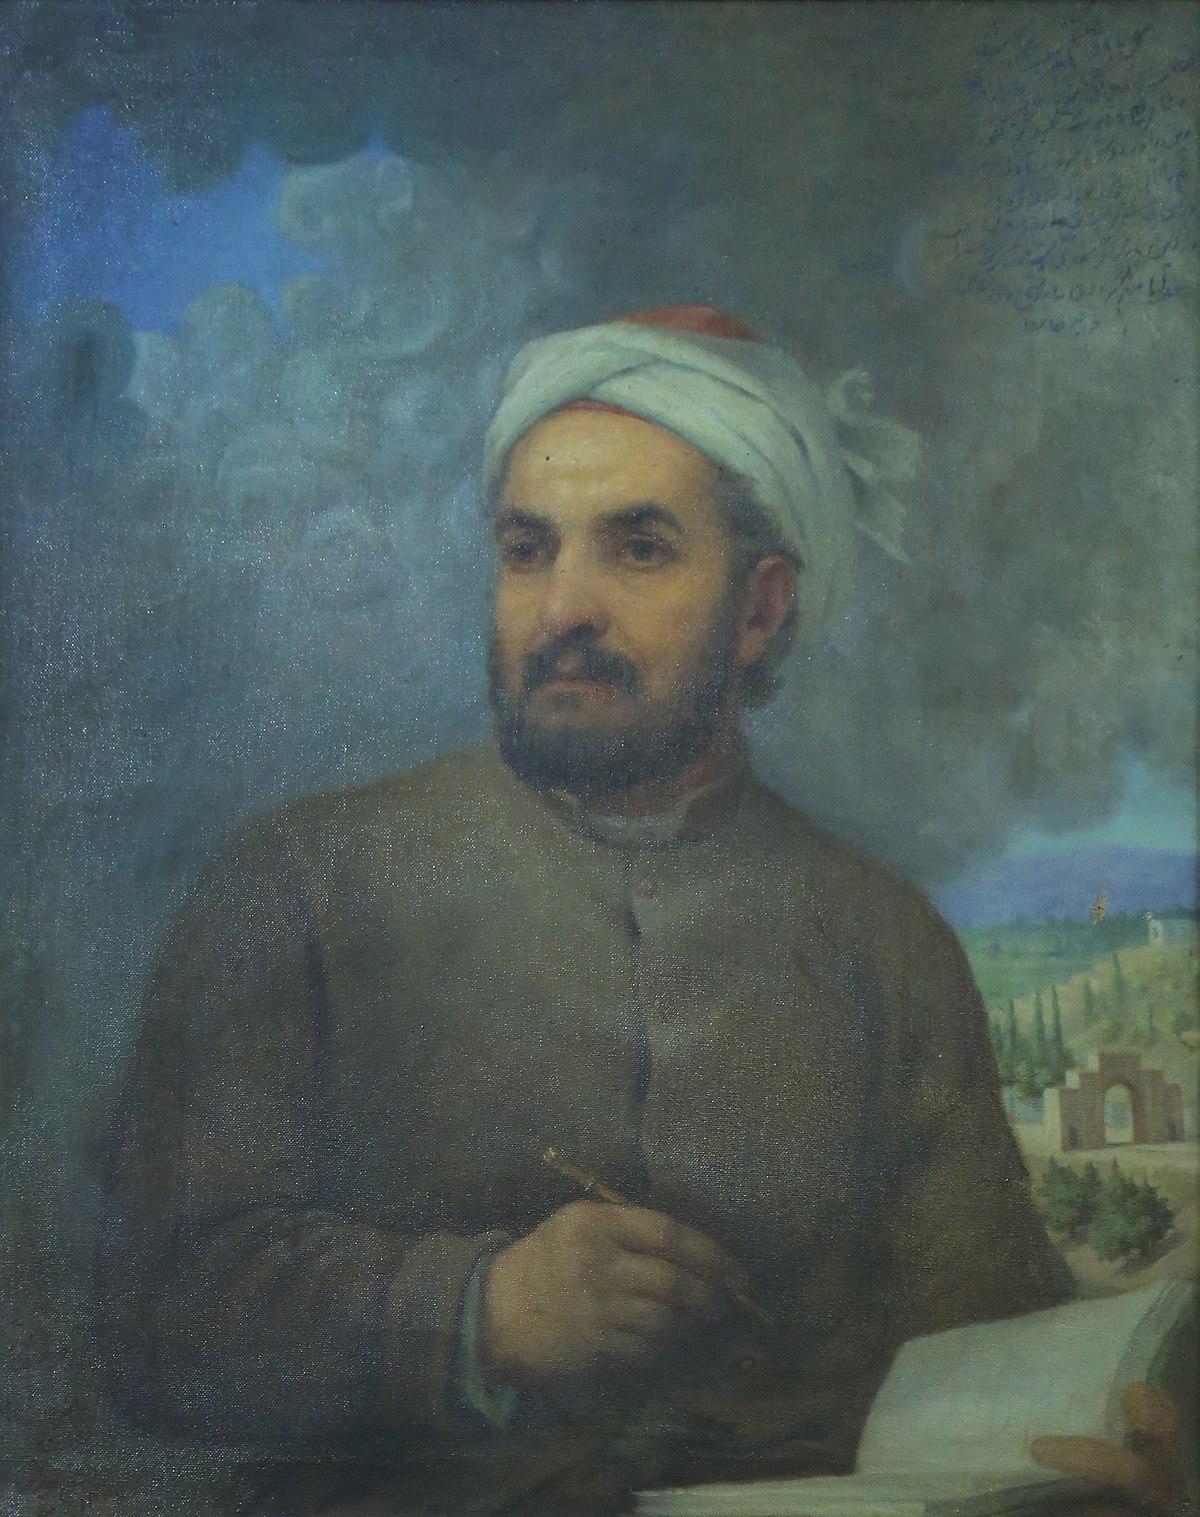 Xāwje Shams-od-Dīn Moḥammad Ḥāfeẓ-e Shīrāzī Hafez (حافظ) خواجه شمسالدین محمّد حافظ شیرازی